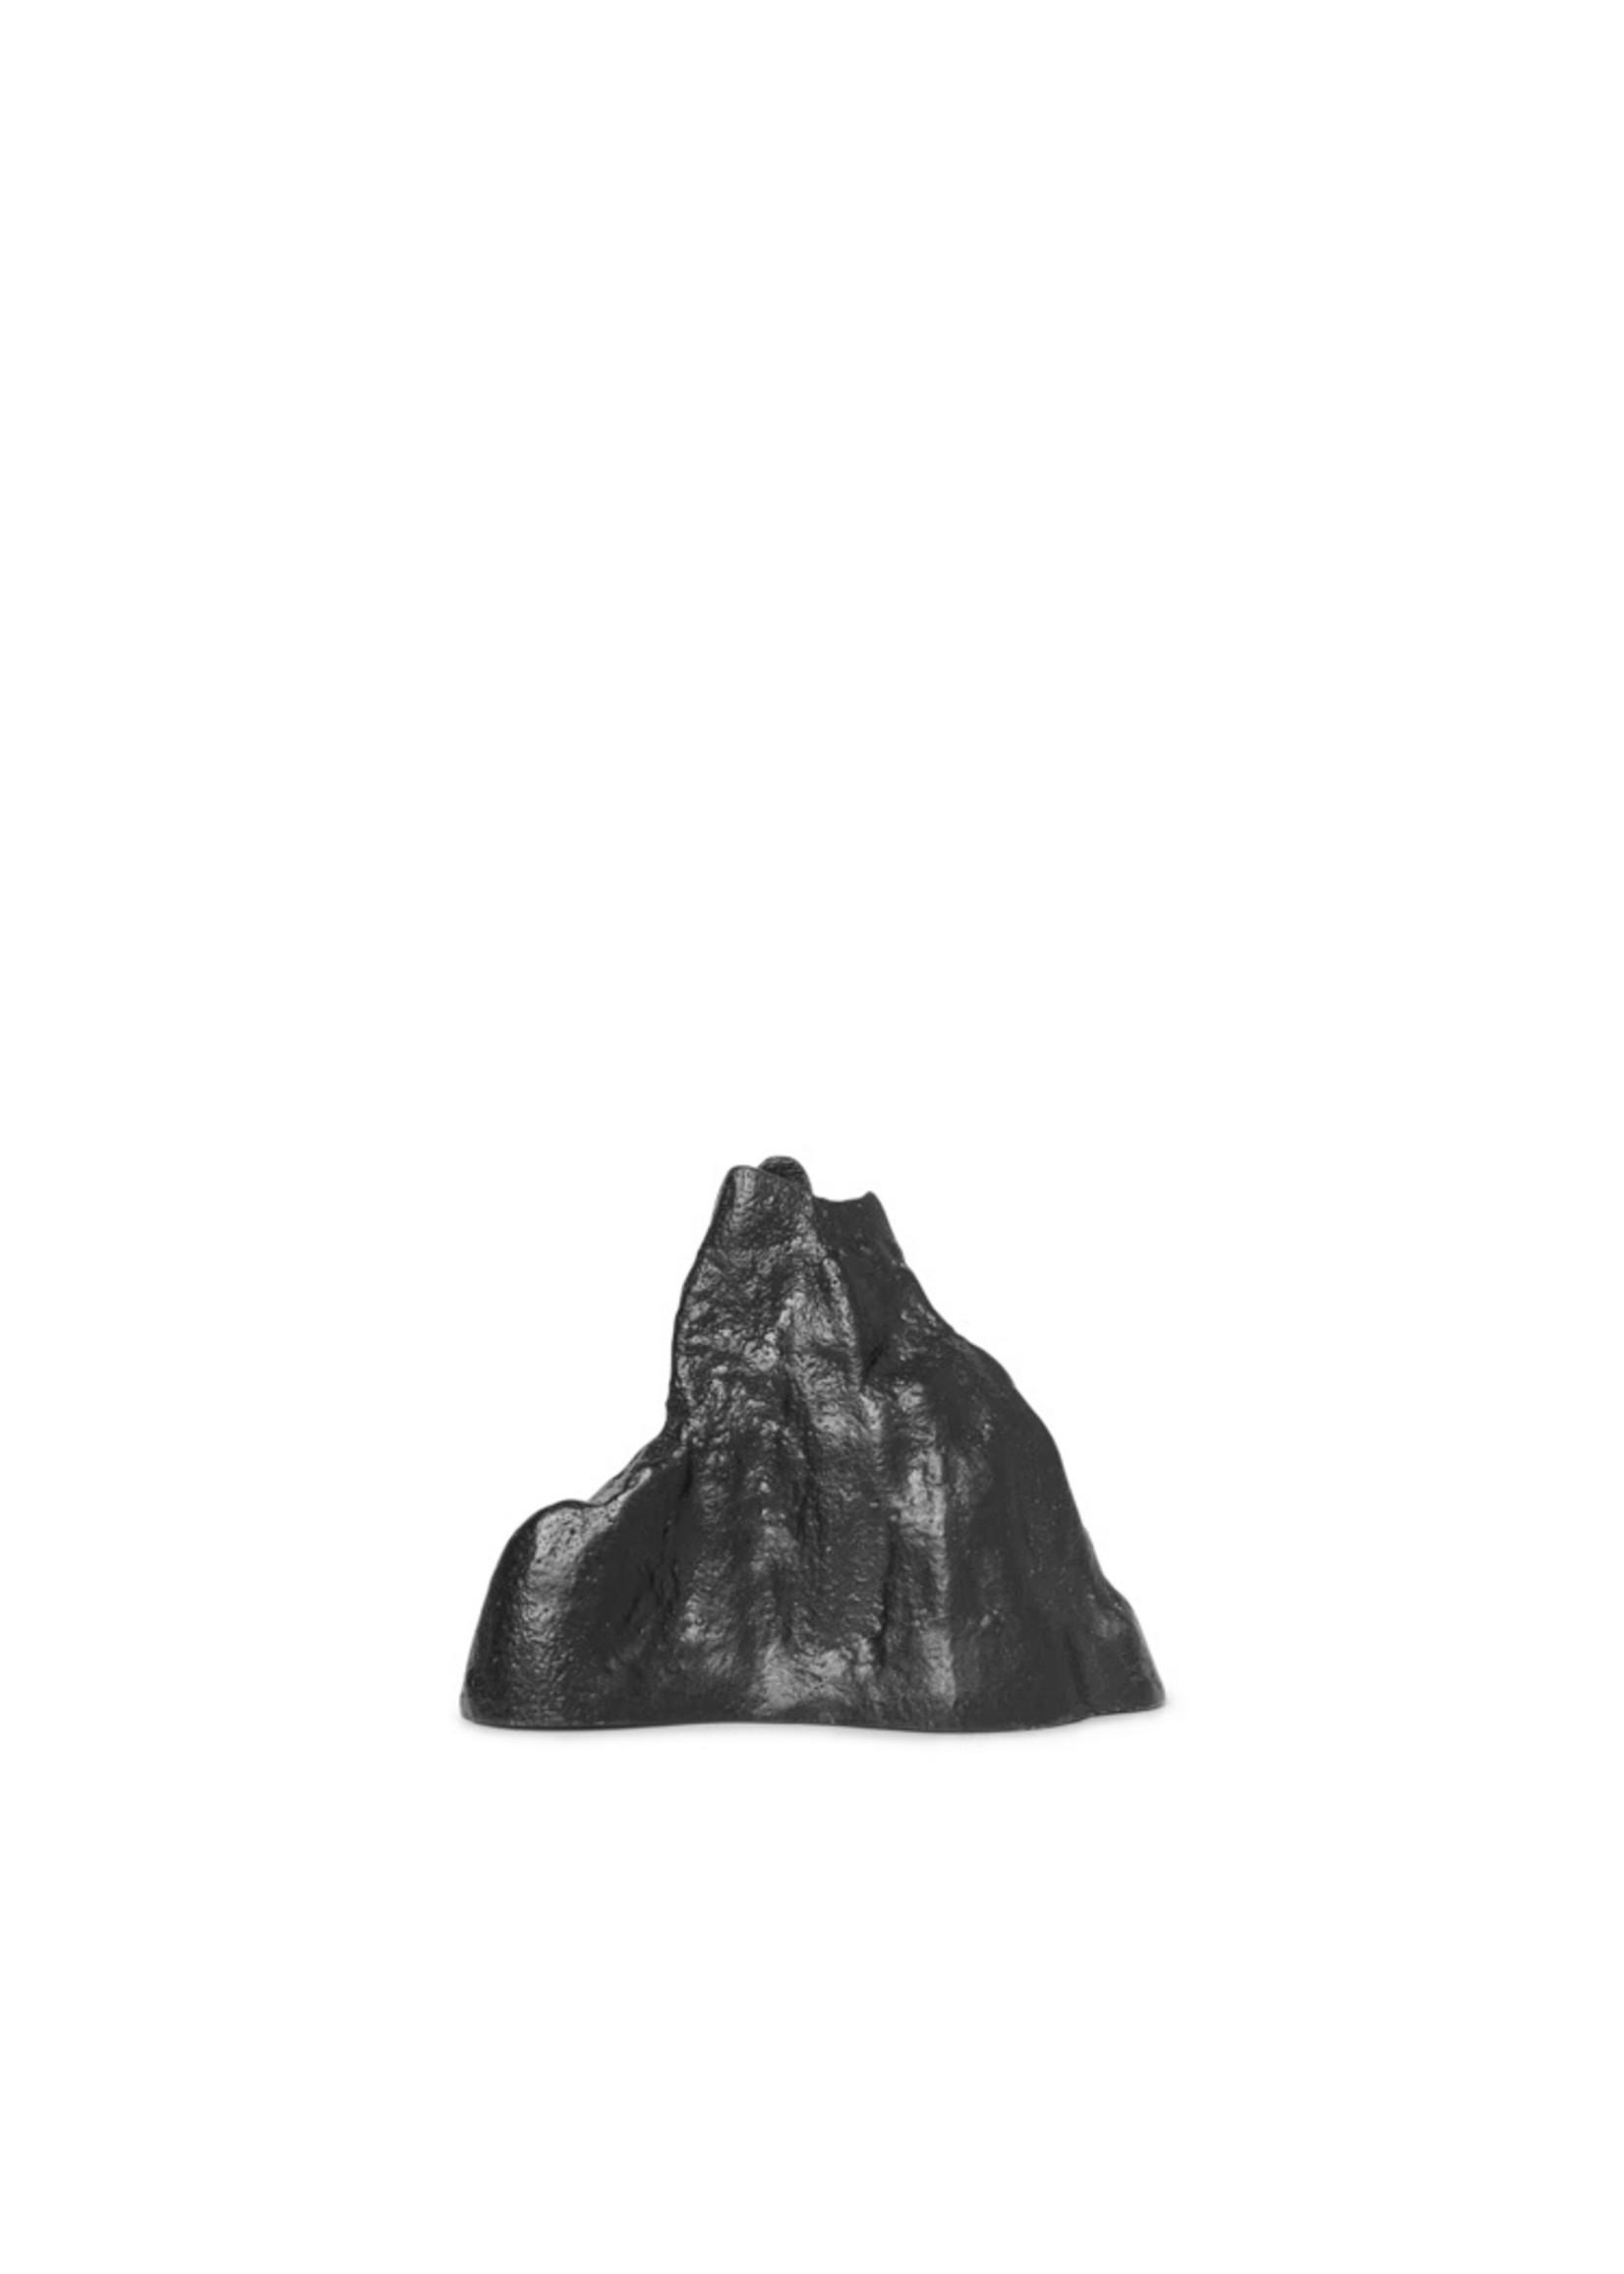 ferm LIVING ferm LIVING Stone Candle Holder - Small - Black Alu